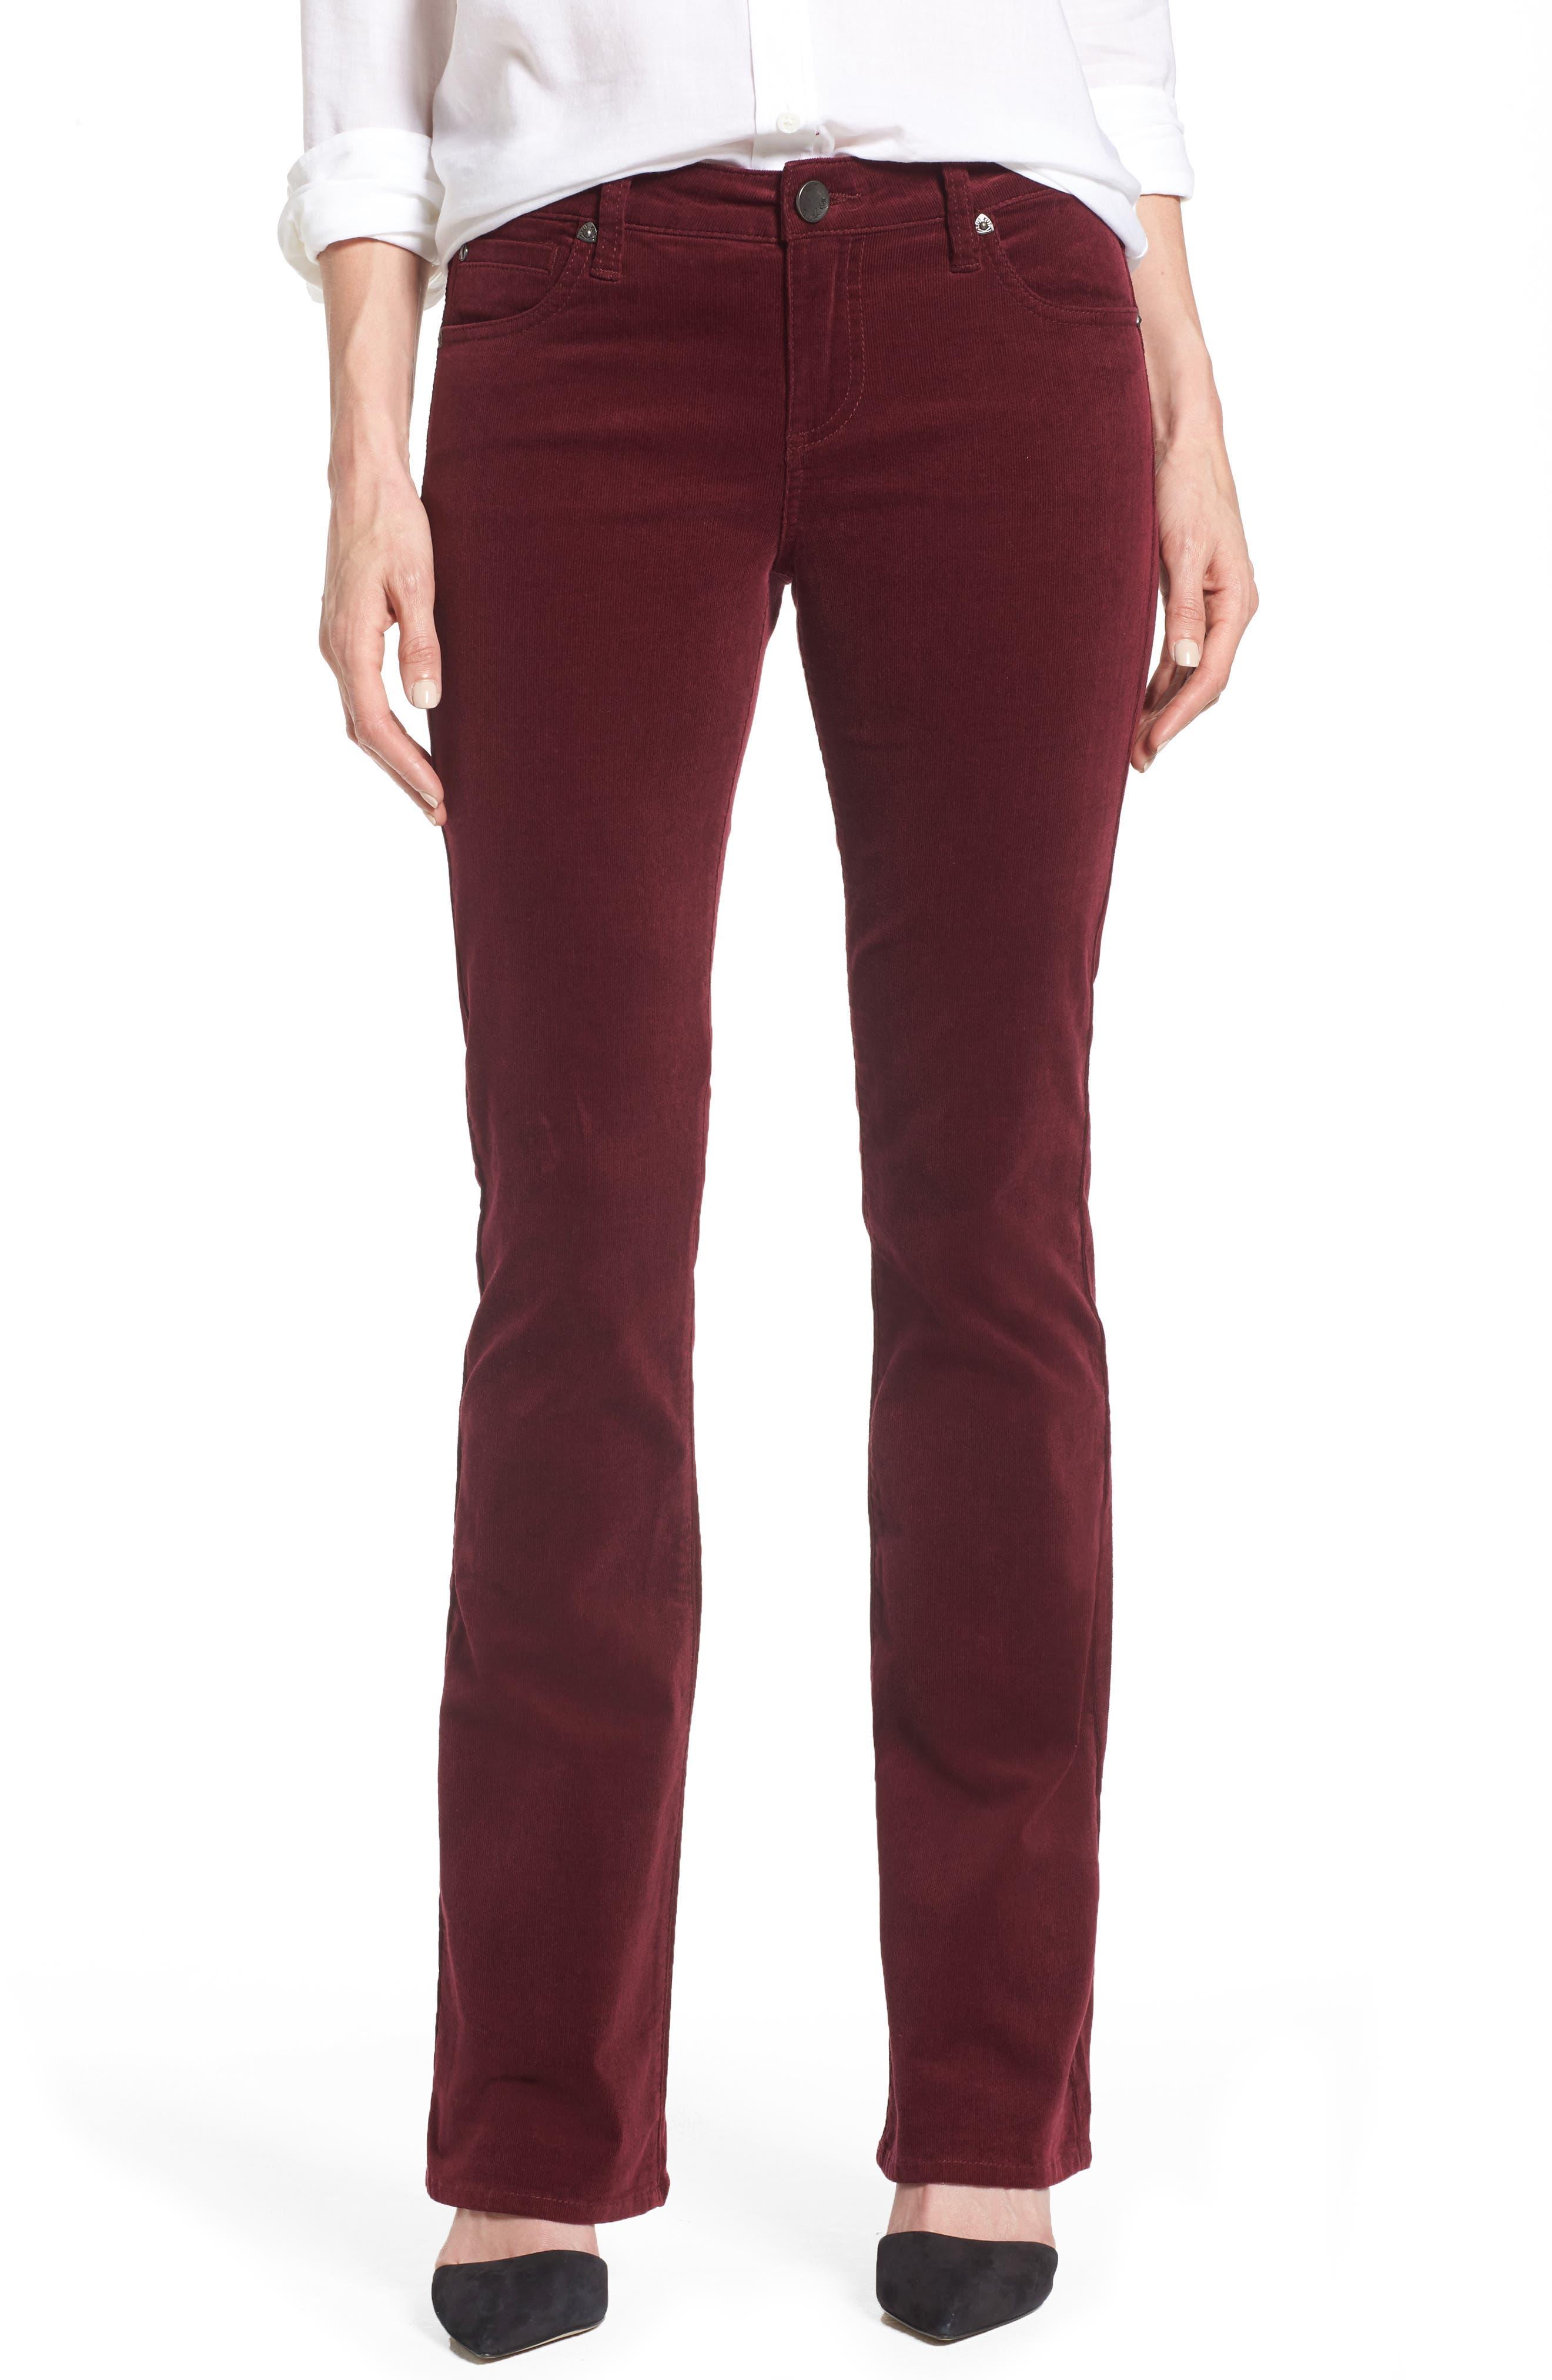 Baby Bootcut Corduroy Jeans,                         Main,                         color, Deep Burgundy